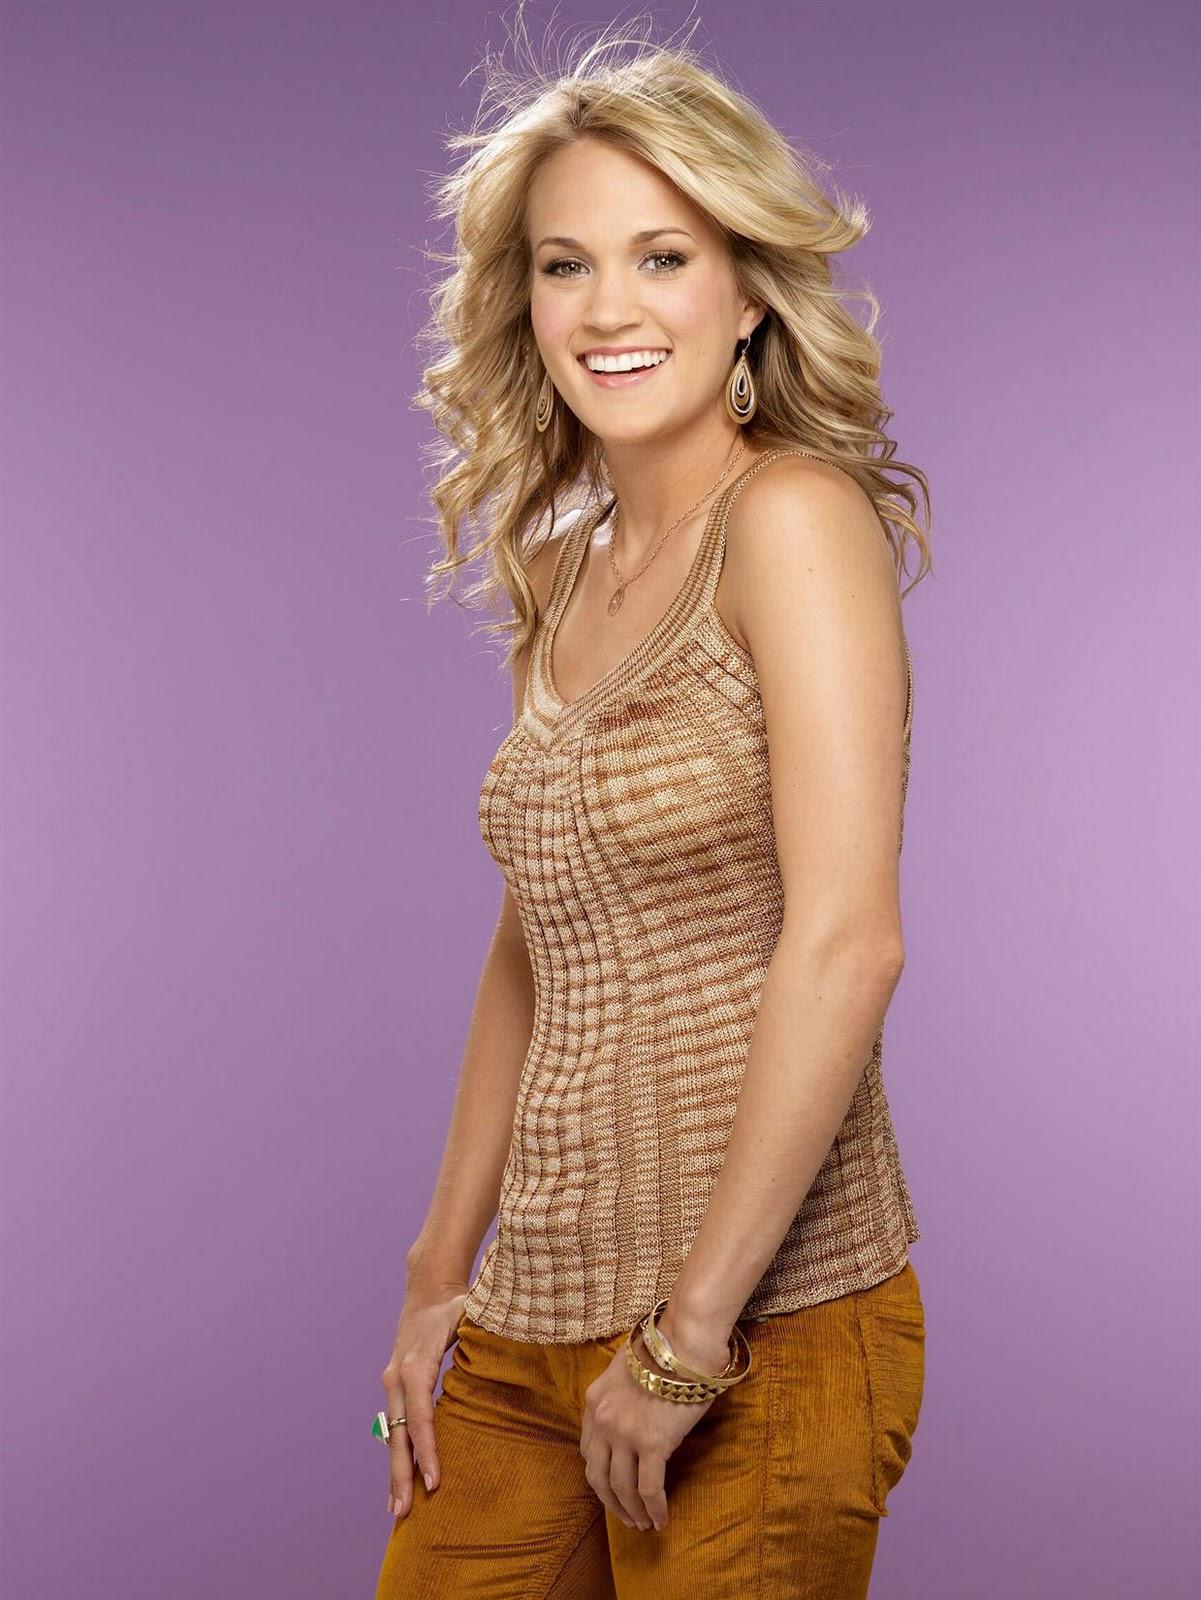 http://3.bp.blogspot.com/-3bTbL0RQ9dk/Tw2esrABwtI/AAAAAAAAFF8/M5VDatBbSKs/s1600/Carrie+Underwood+Hot-5.jpg